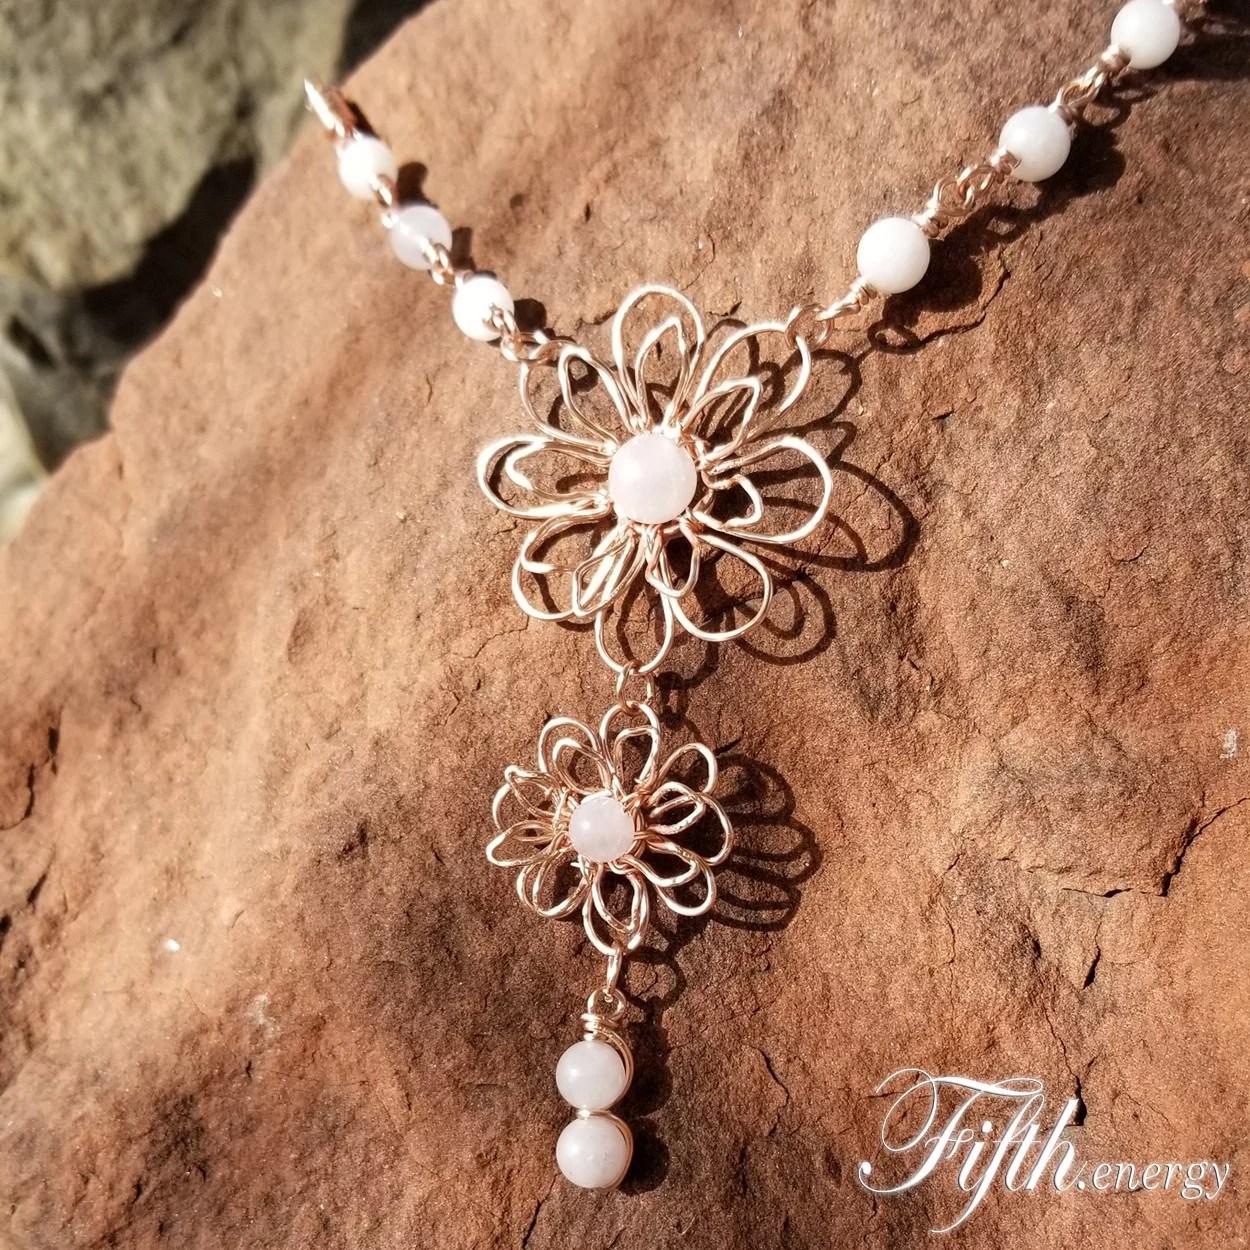 Rose Quartz Gemstone Flower Necklace Fifth Energy Jewelry